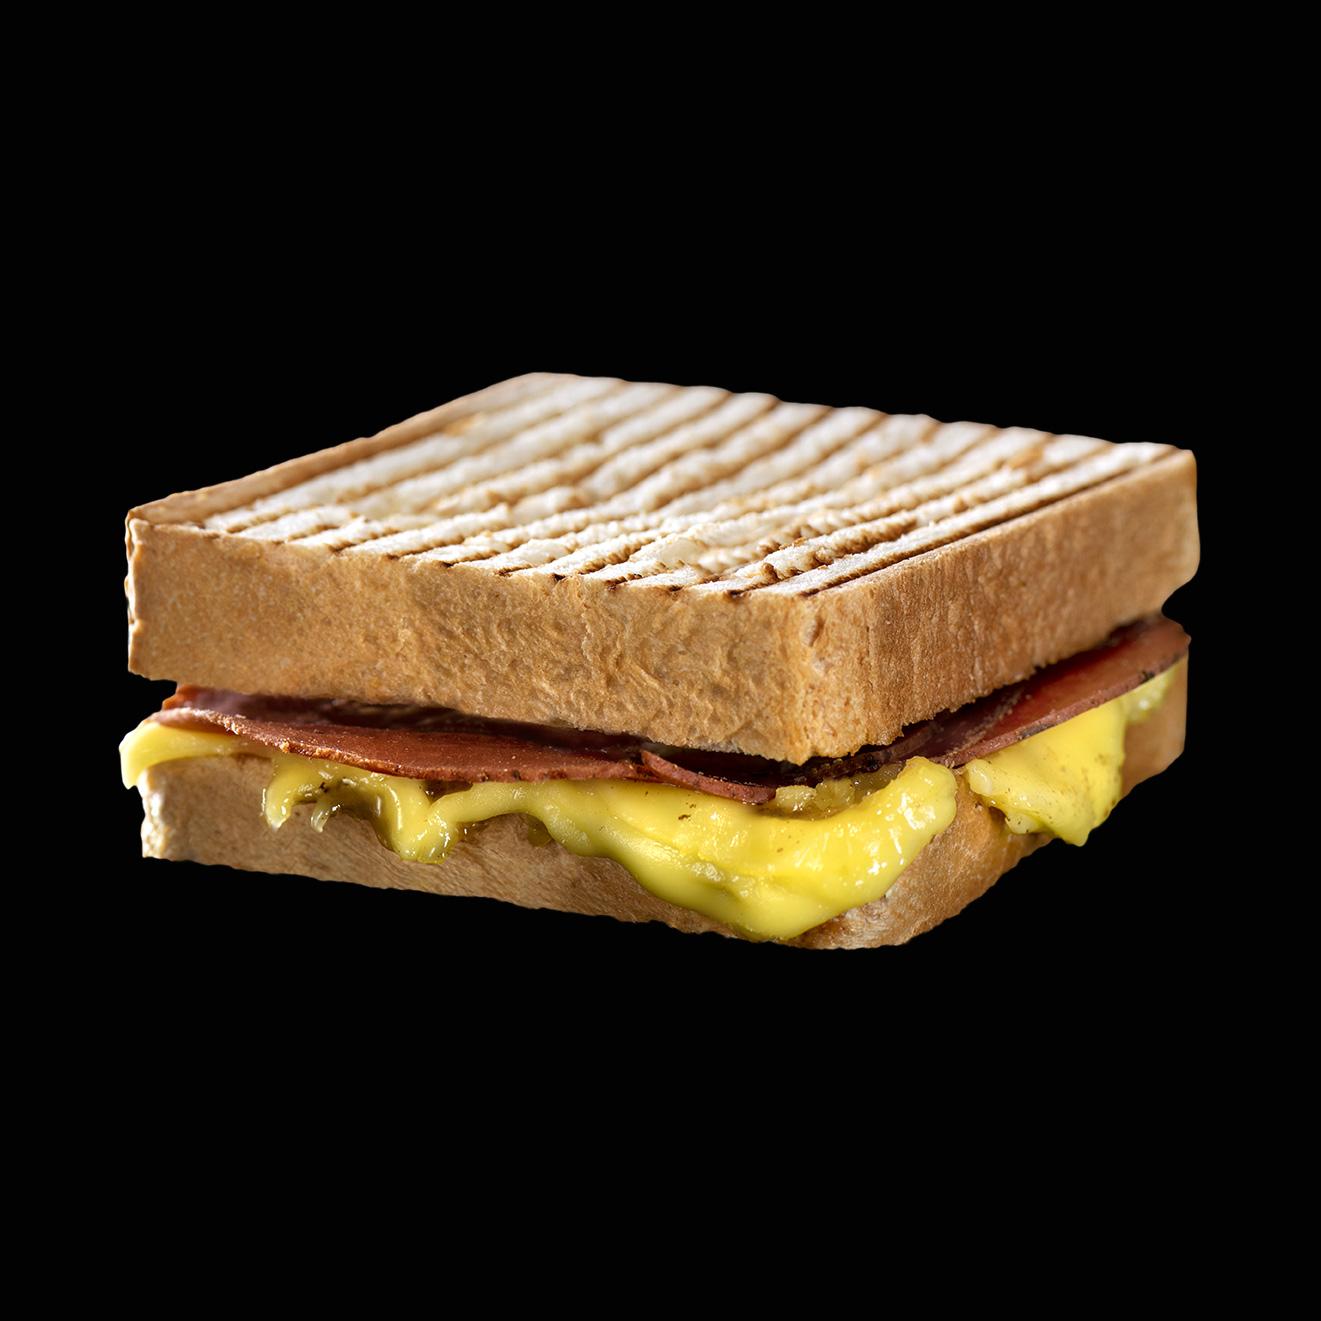 UNCROC Toast